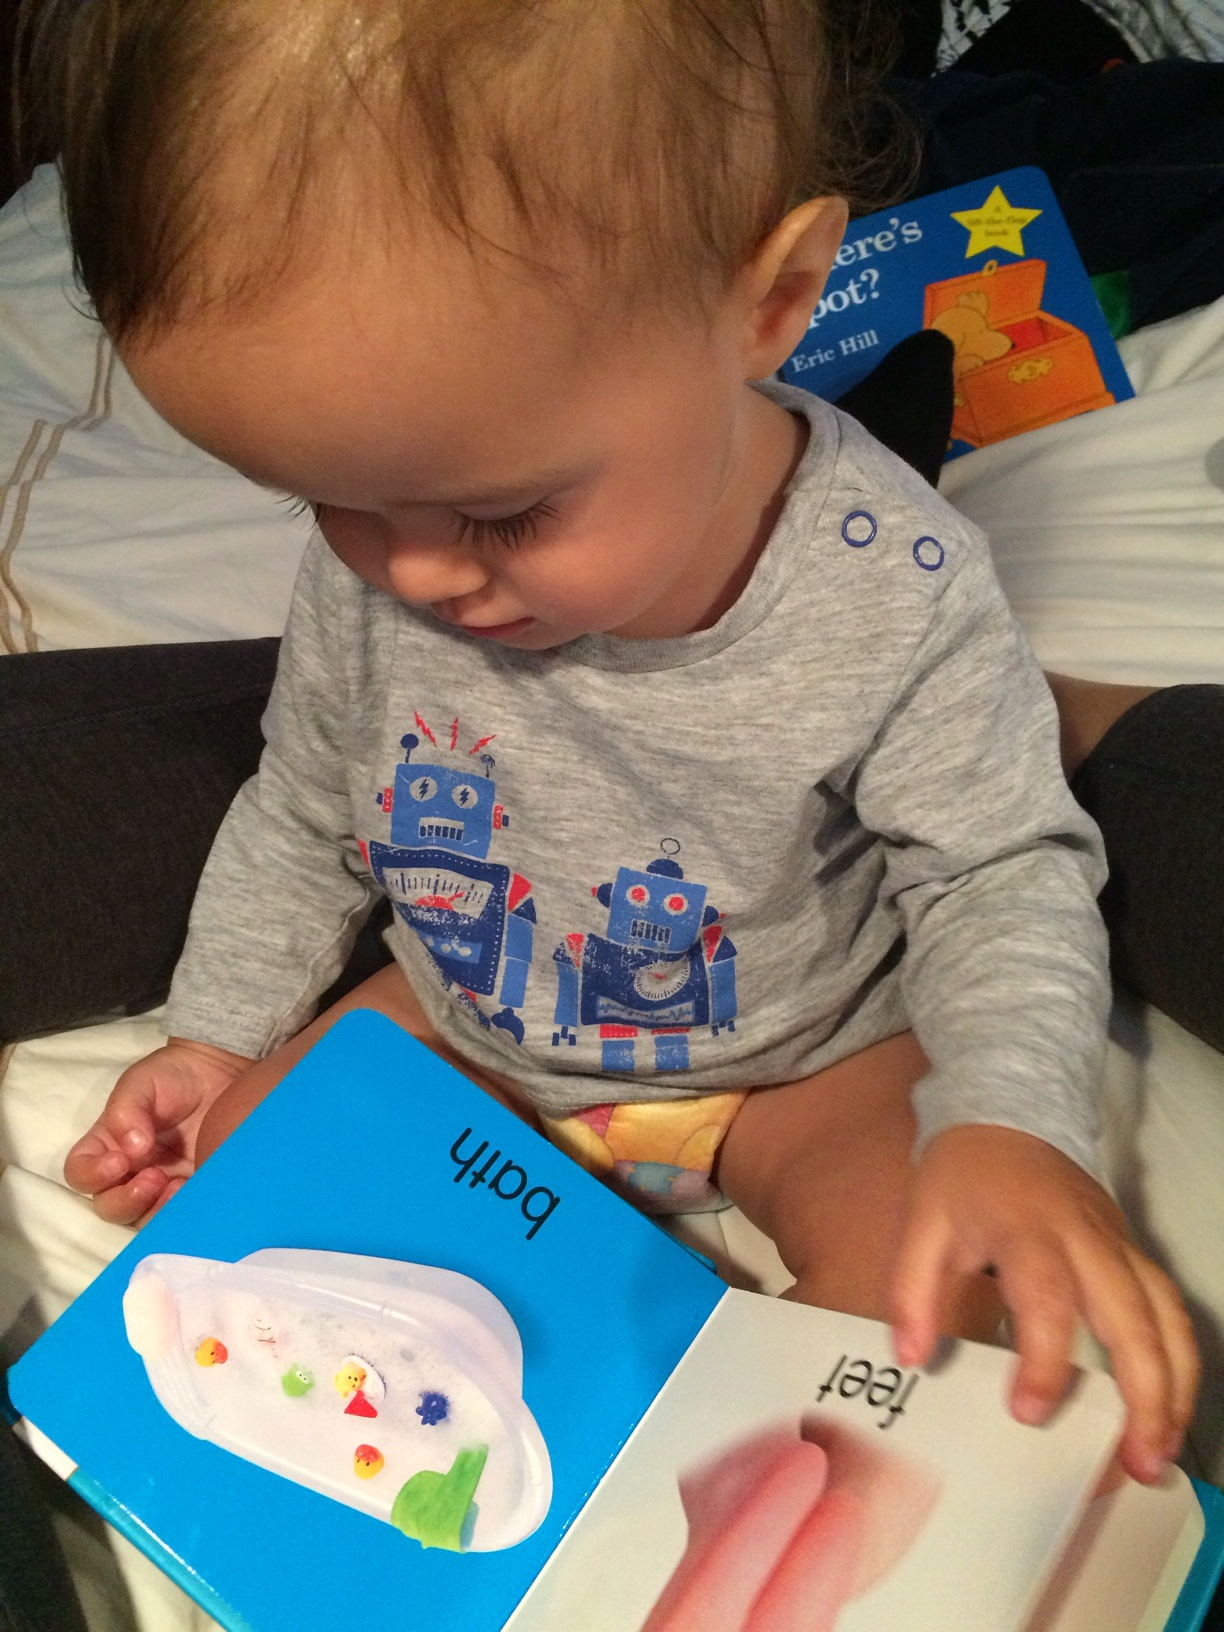 Baby boy o reading